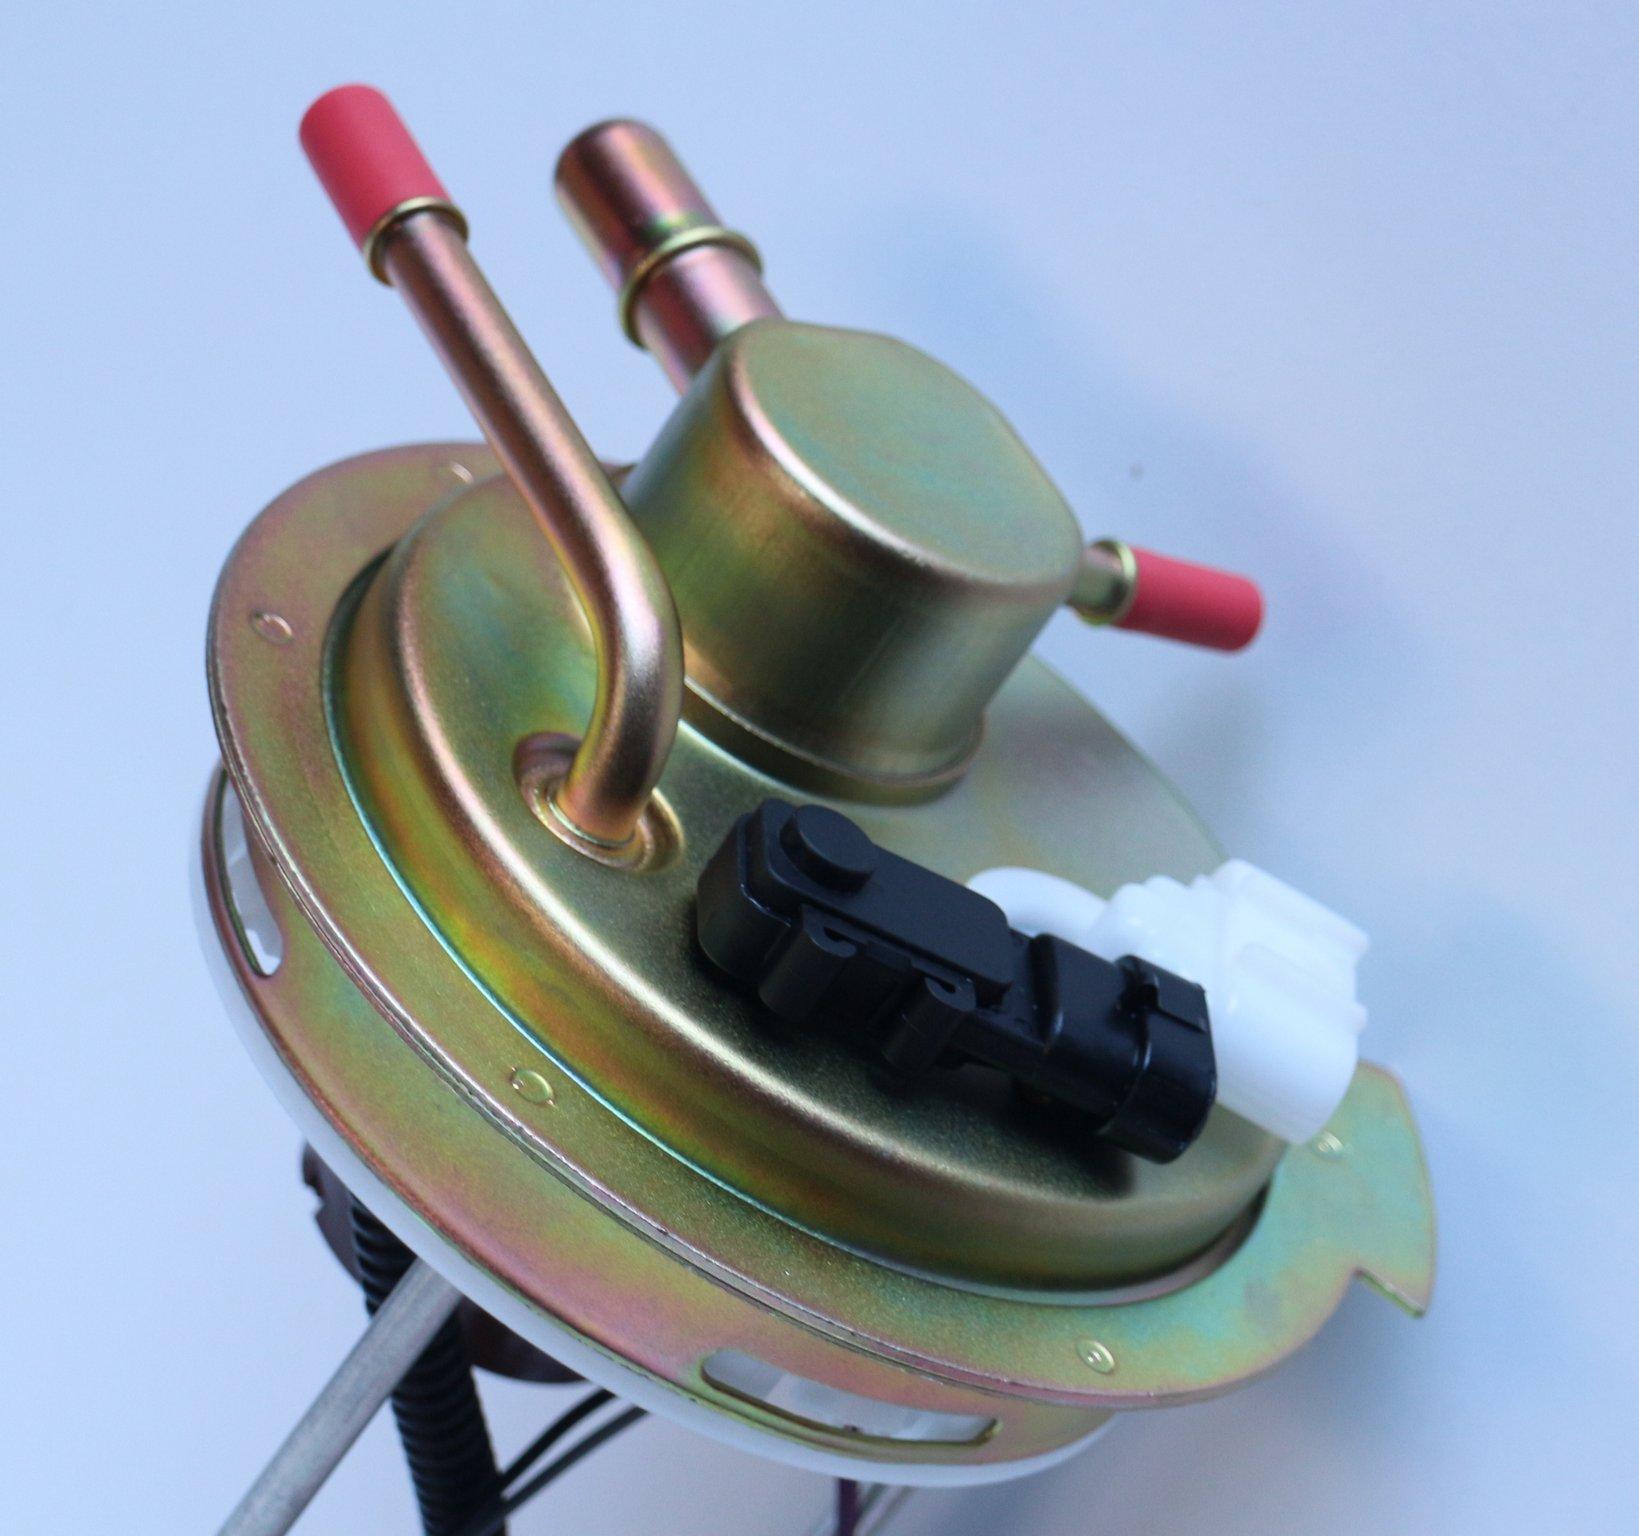 New Delphi FG0434 Fuel Pump Module Assembly for 2006 Savana Express 3500 DIESEL